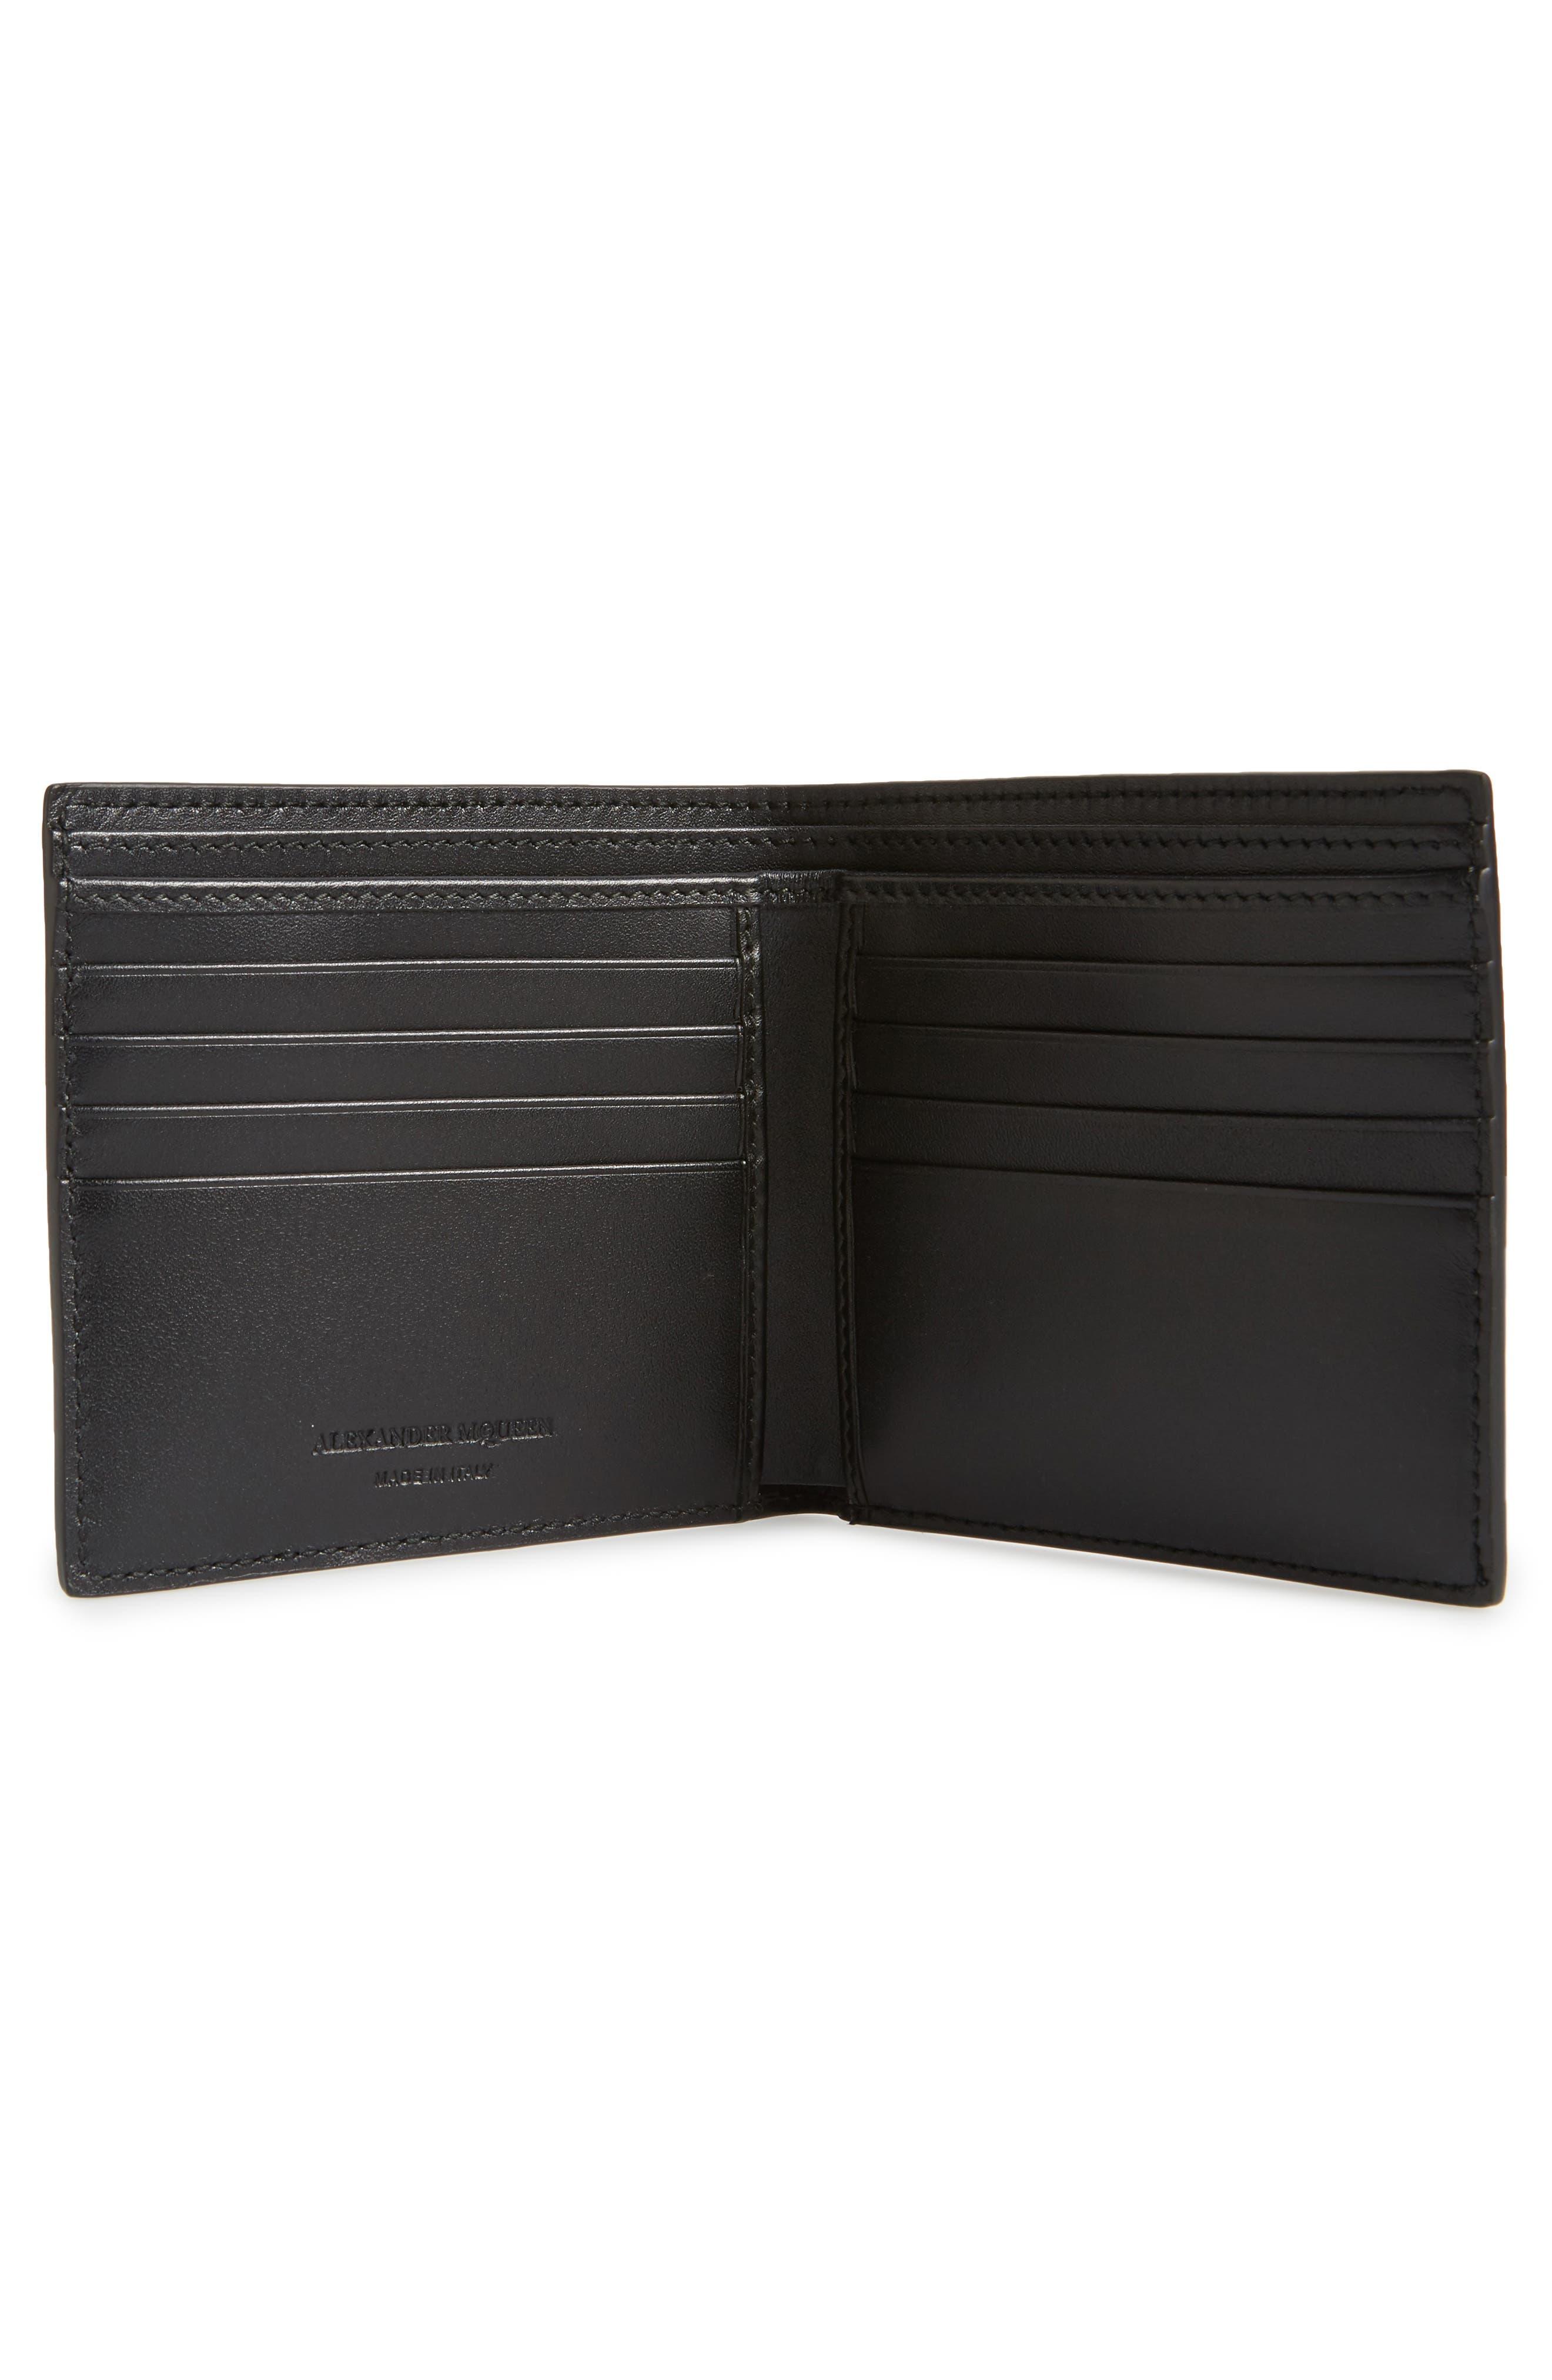 Alternate Image 2  - Alexander McQueen Camo Leather Billfold Wallet